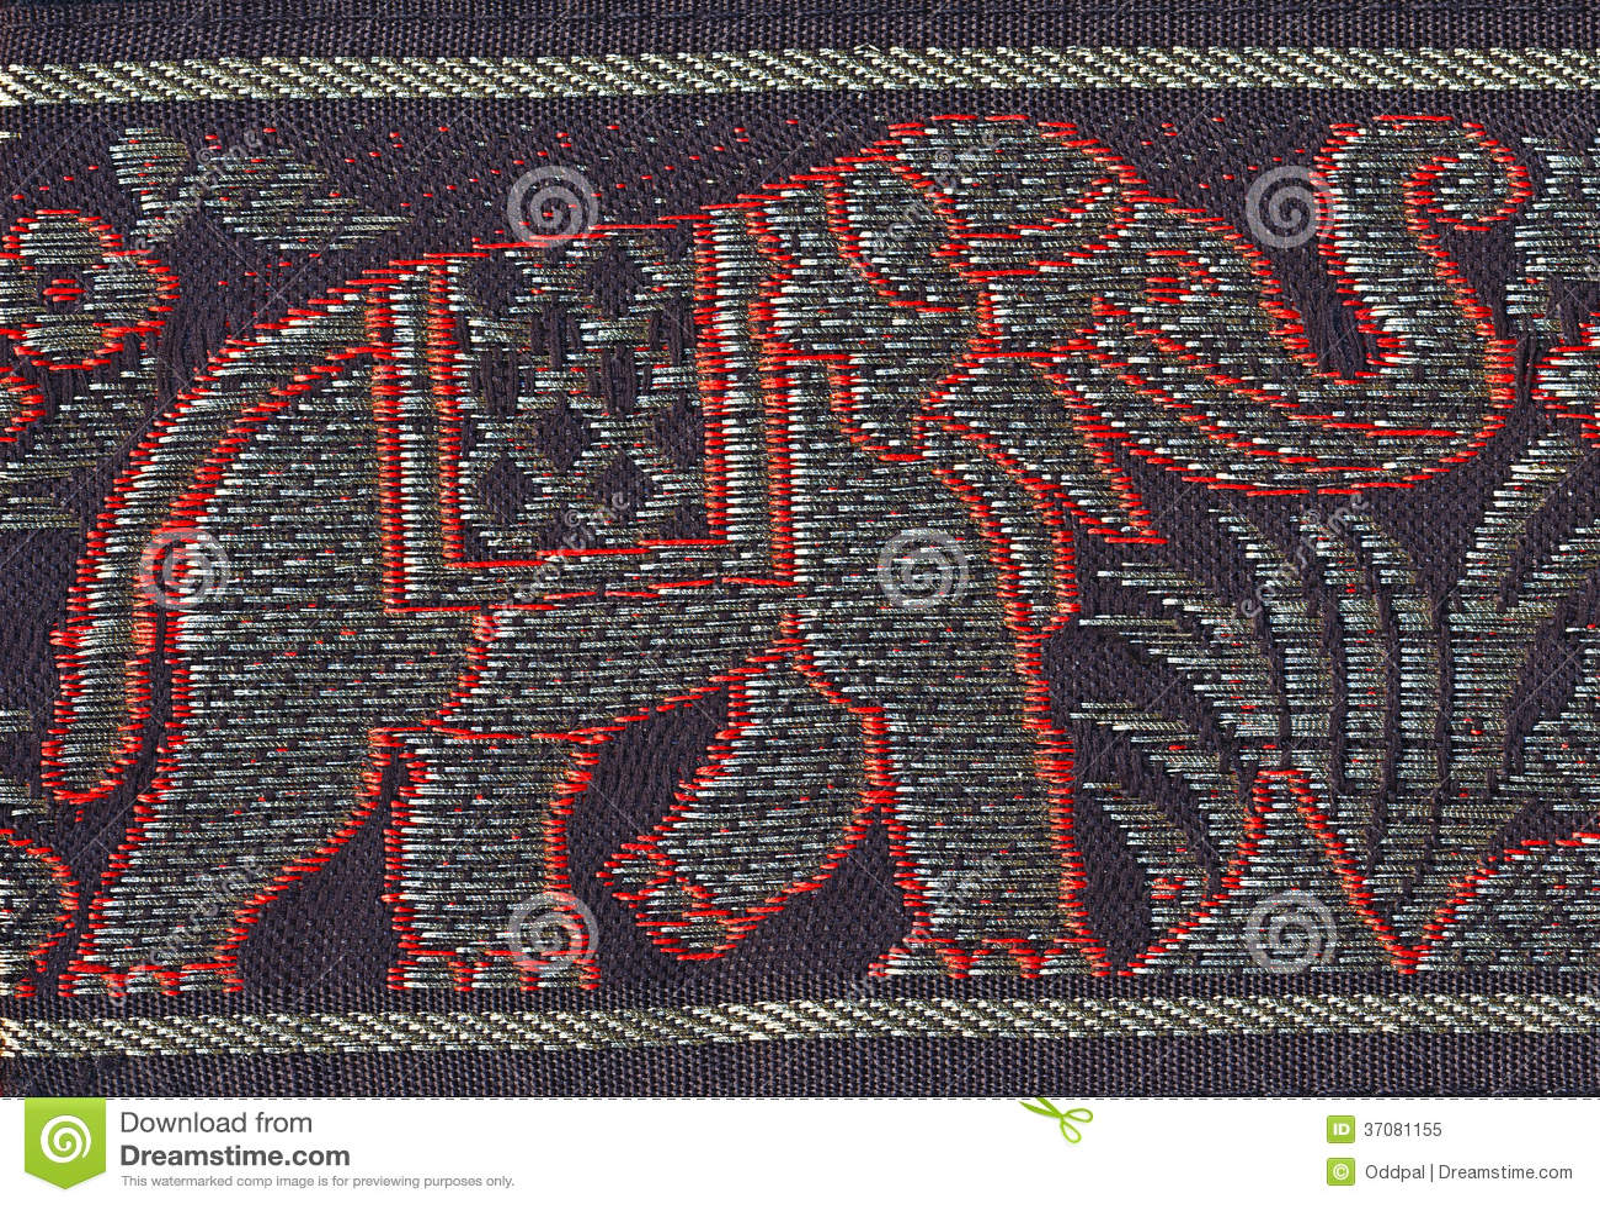 Embroidered Elephant Royalty Free Stock Photo Image